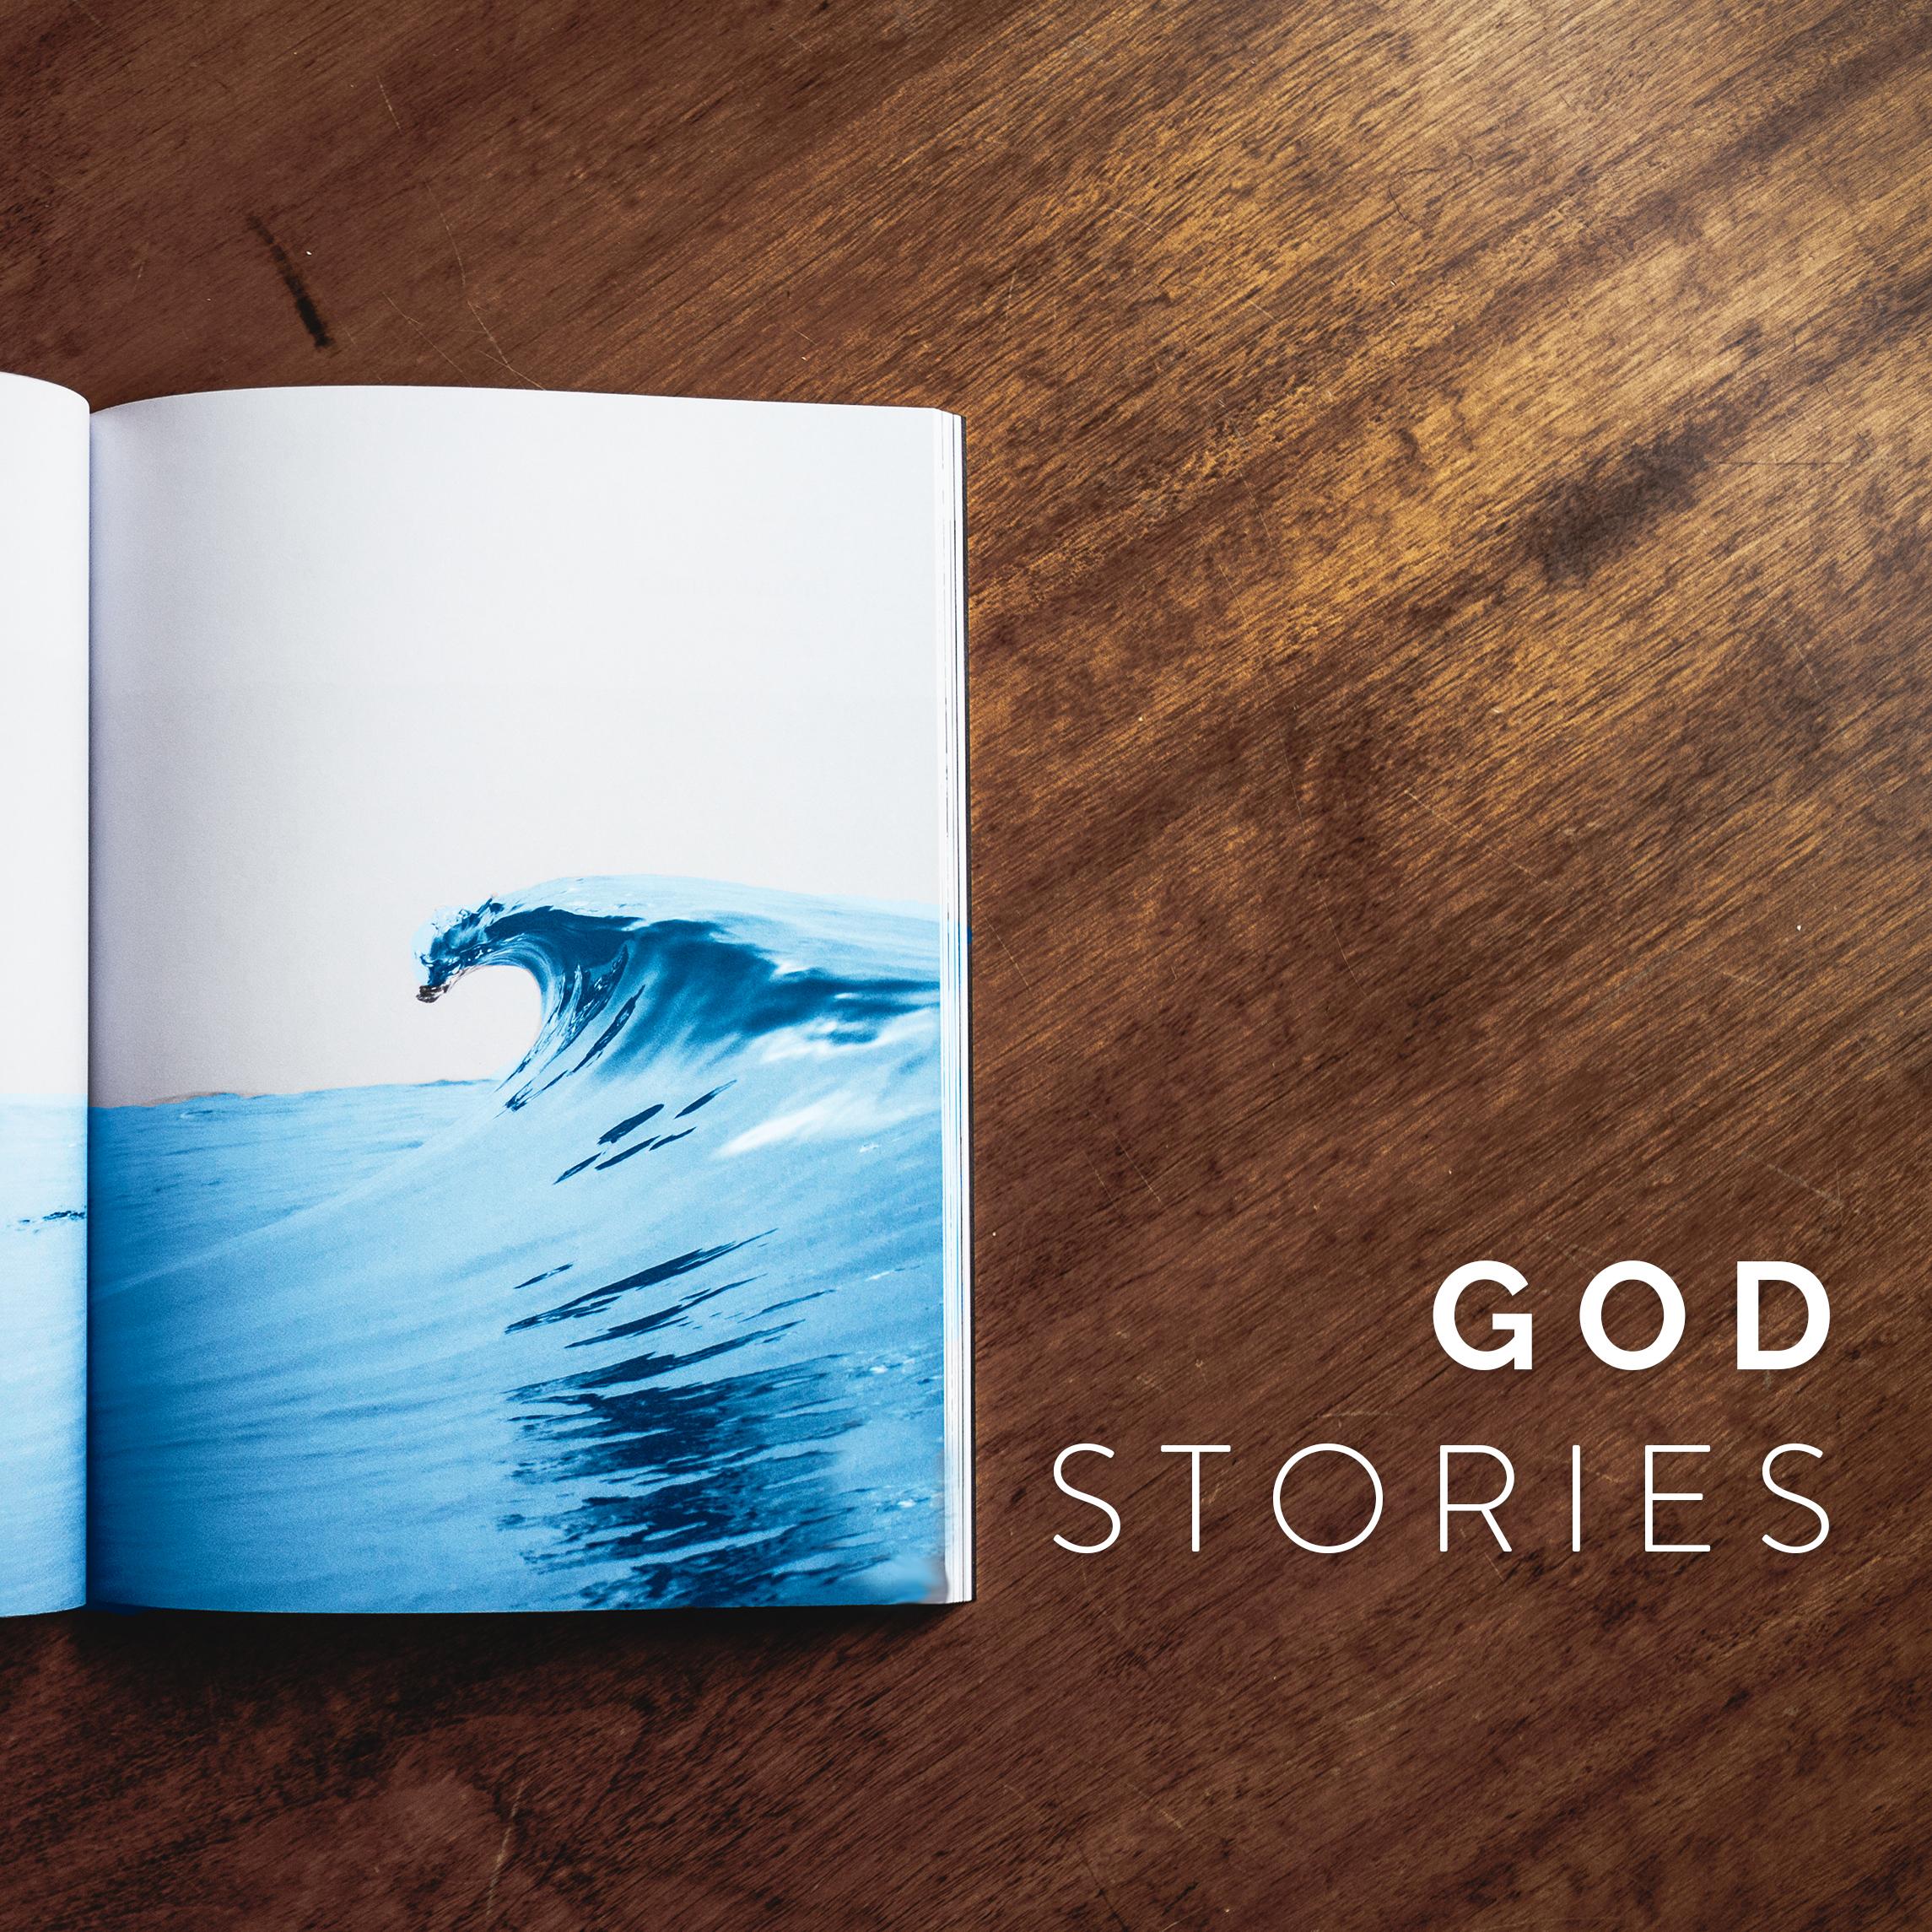 god-stories-1-1.png